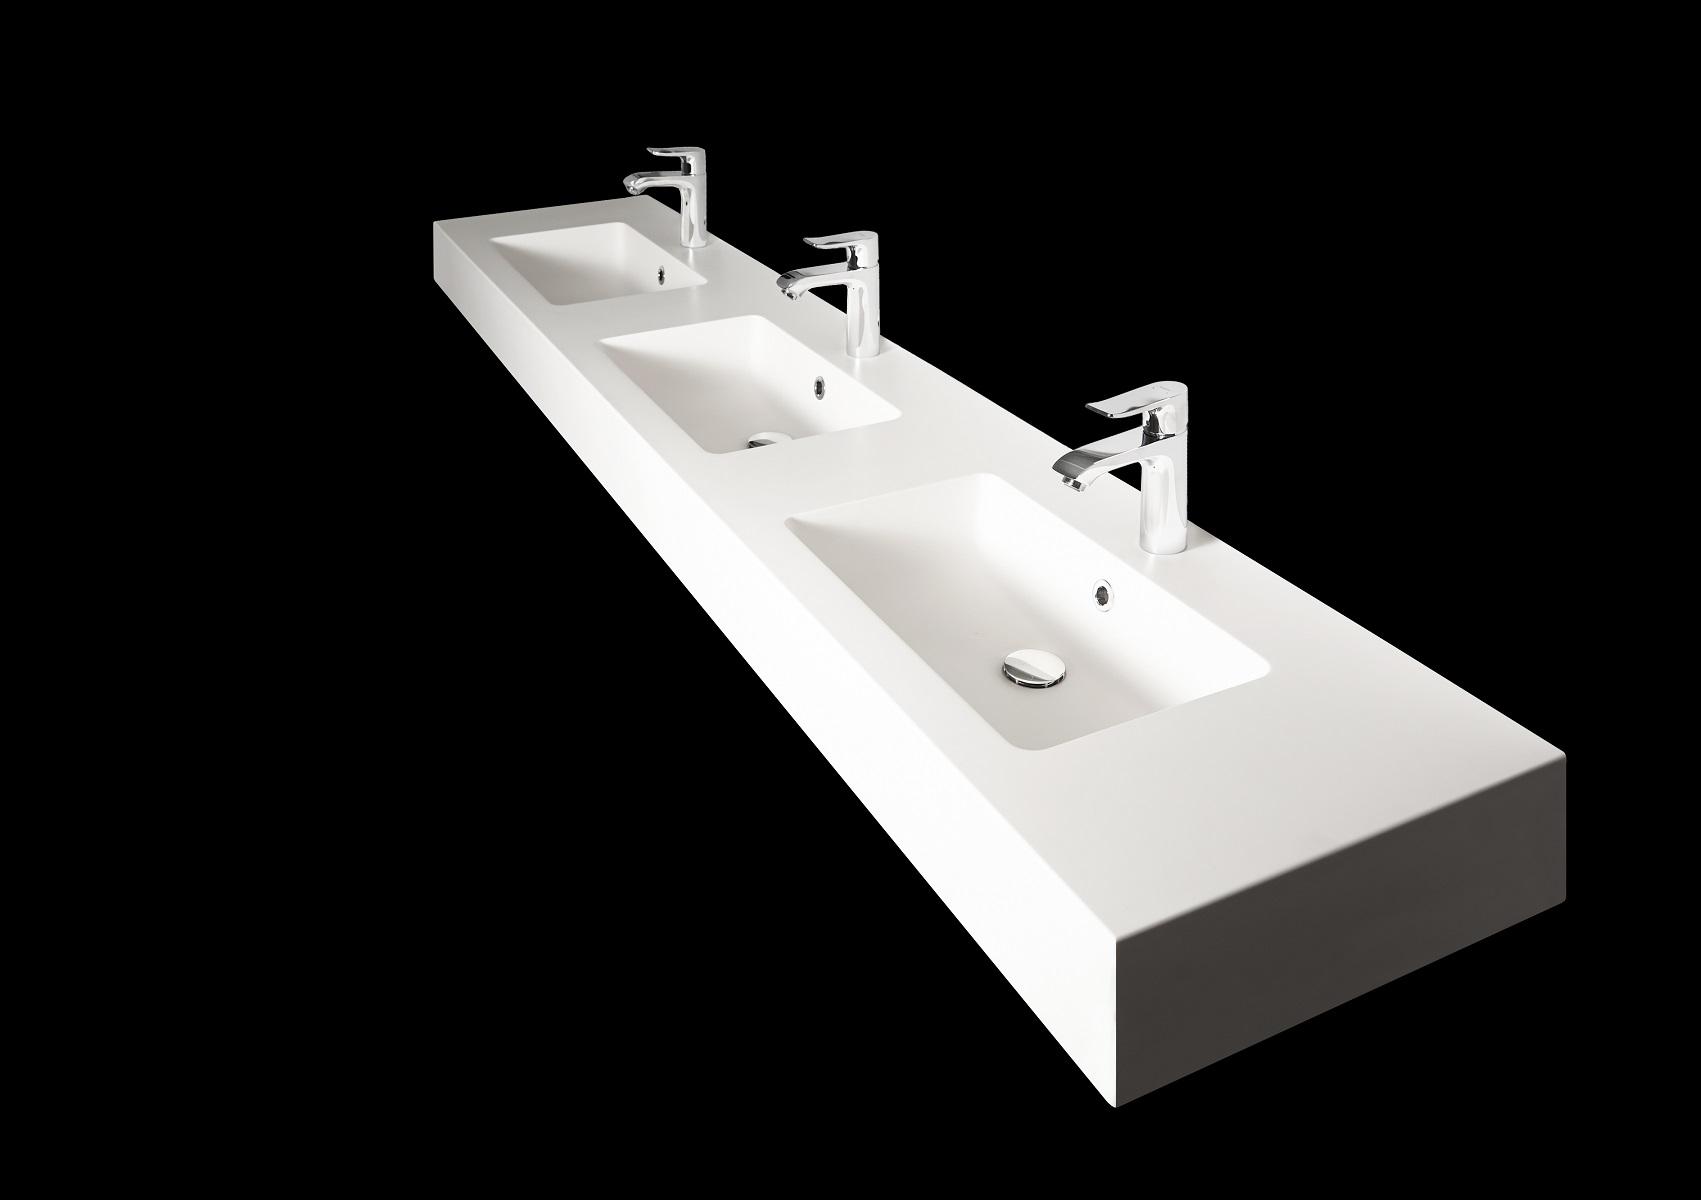 Aquatica Echoes Wht Stone Sink web (1)